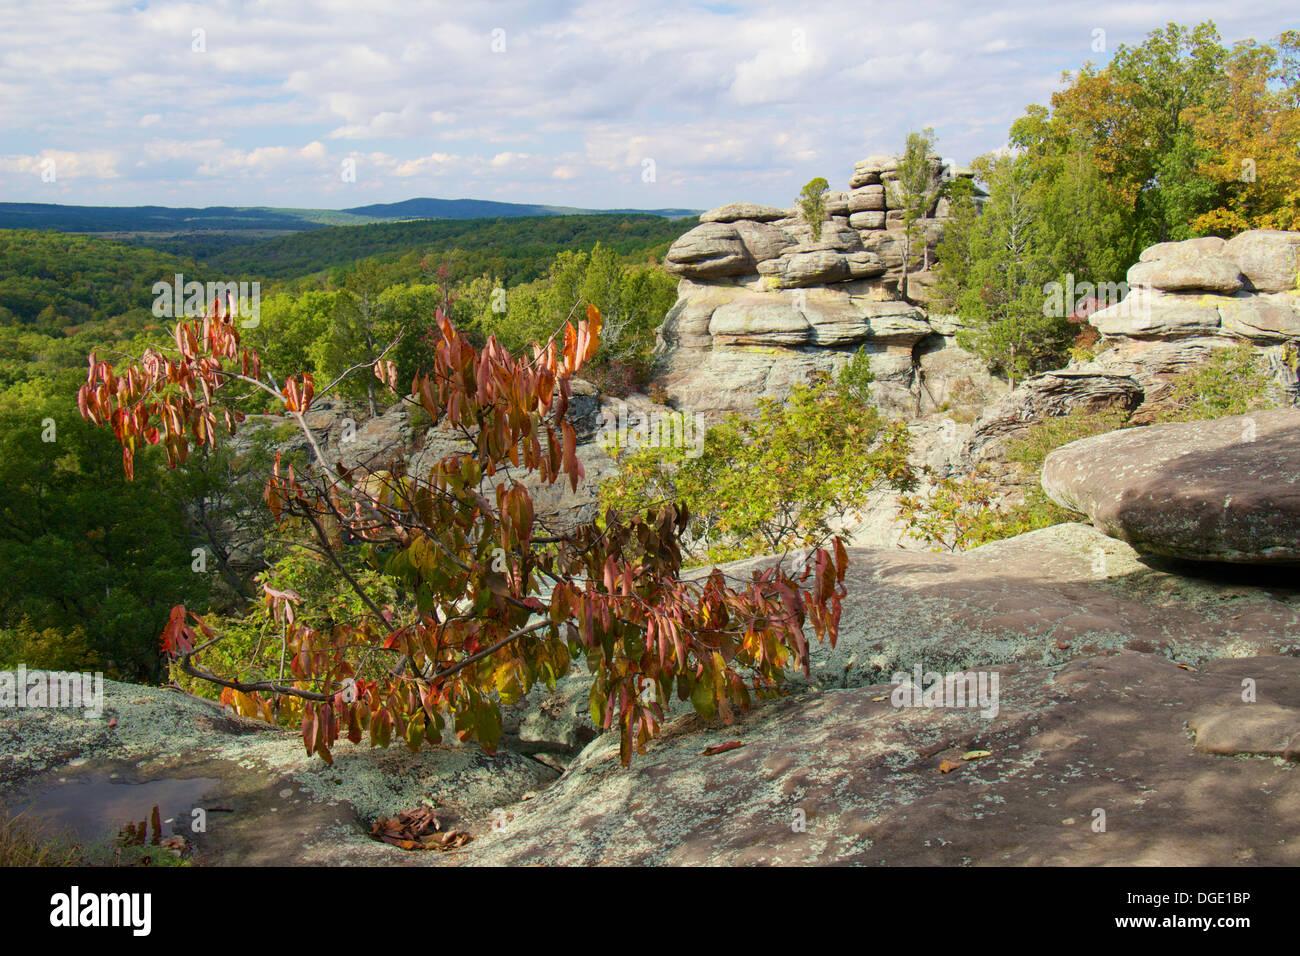 Garden of the Gods Recreation Area, southern Illinois. - Stock Image